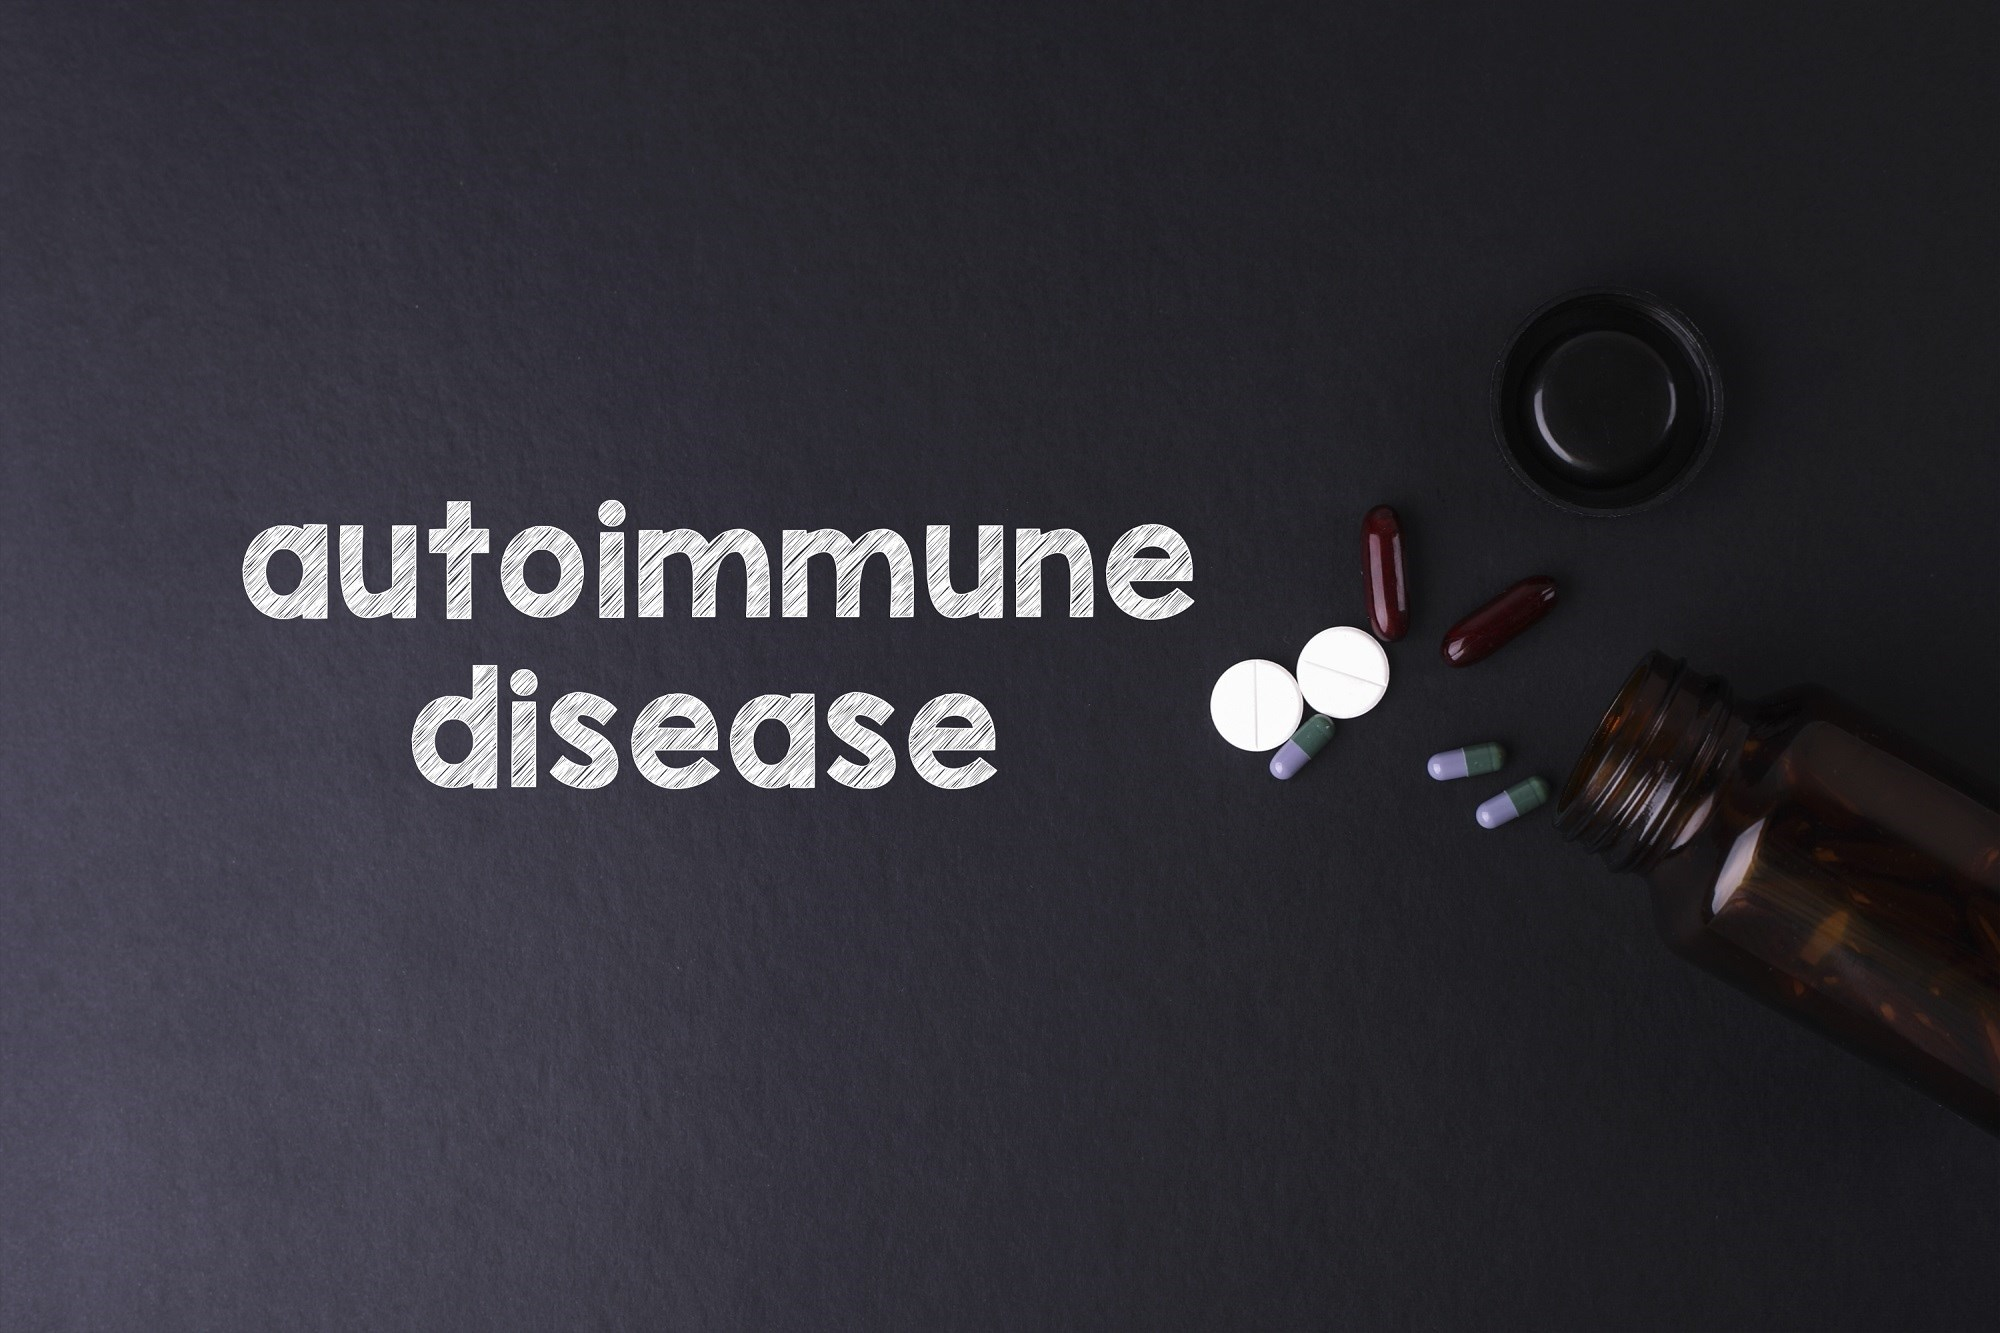 Type 1 Diabetes Confers Extra Risk for Autoimmune Diseases